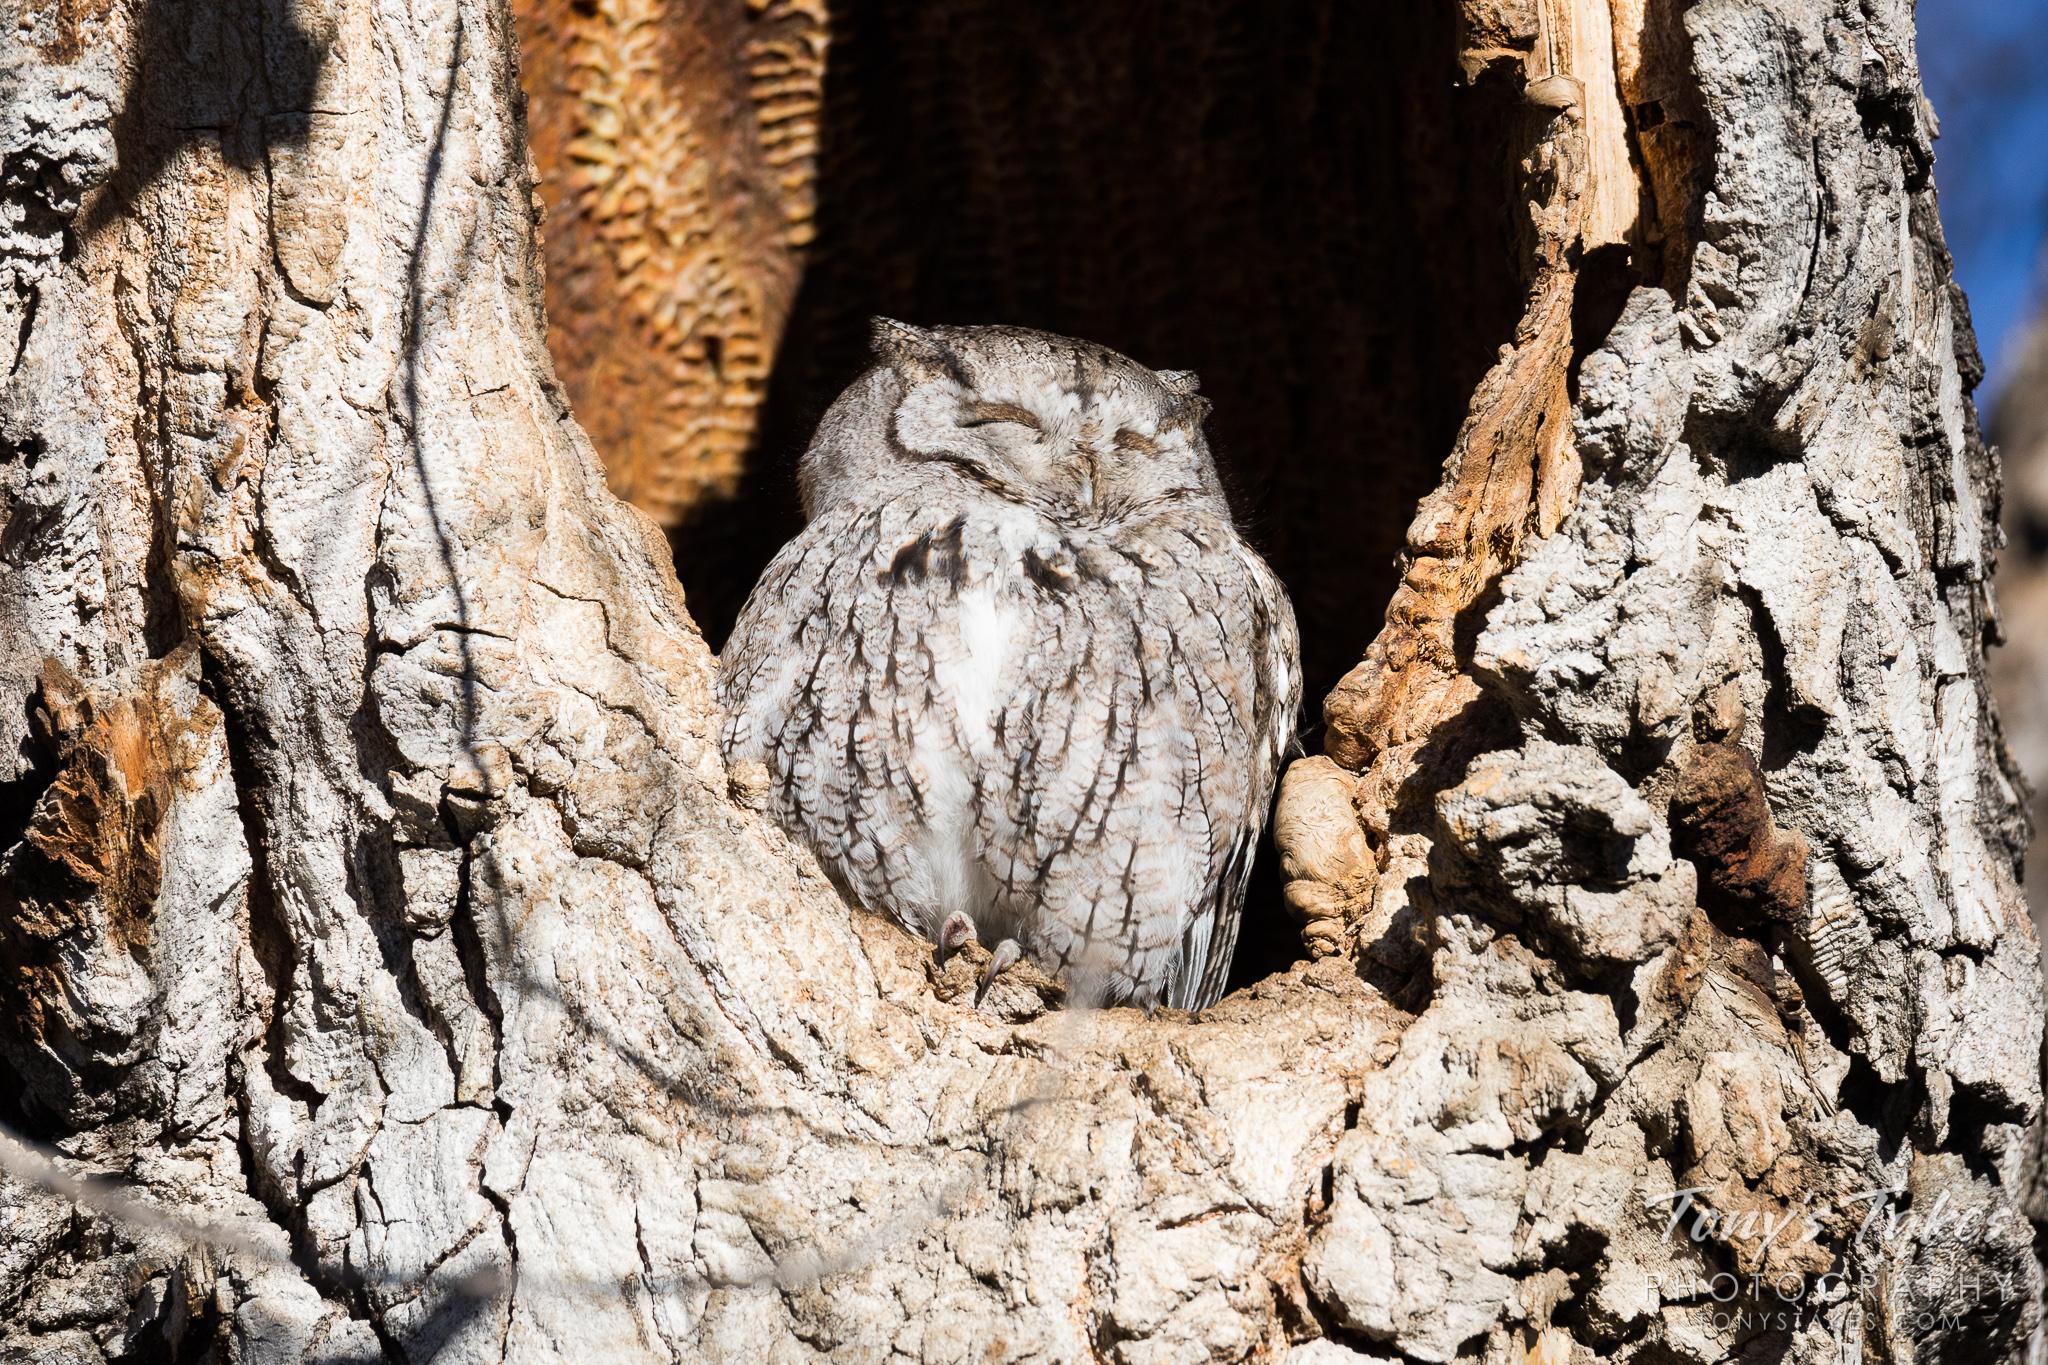 Tiny Eastern Screech Owl soaks in the warm sun